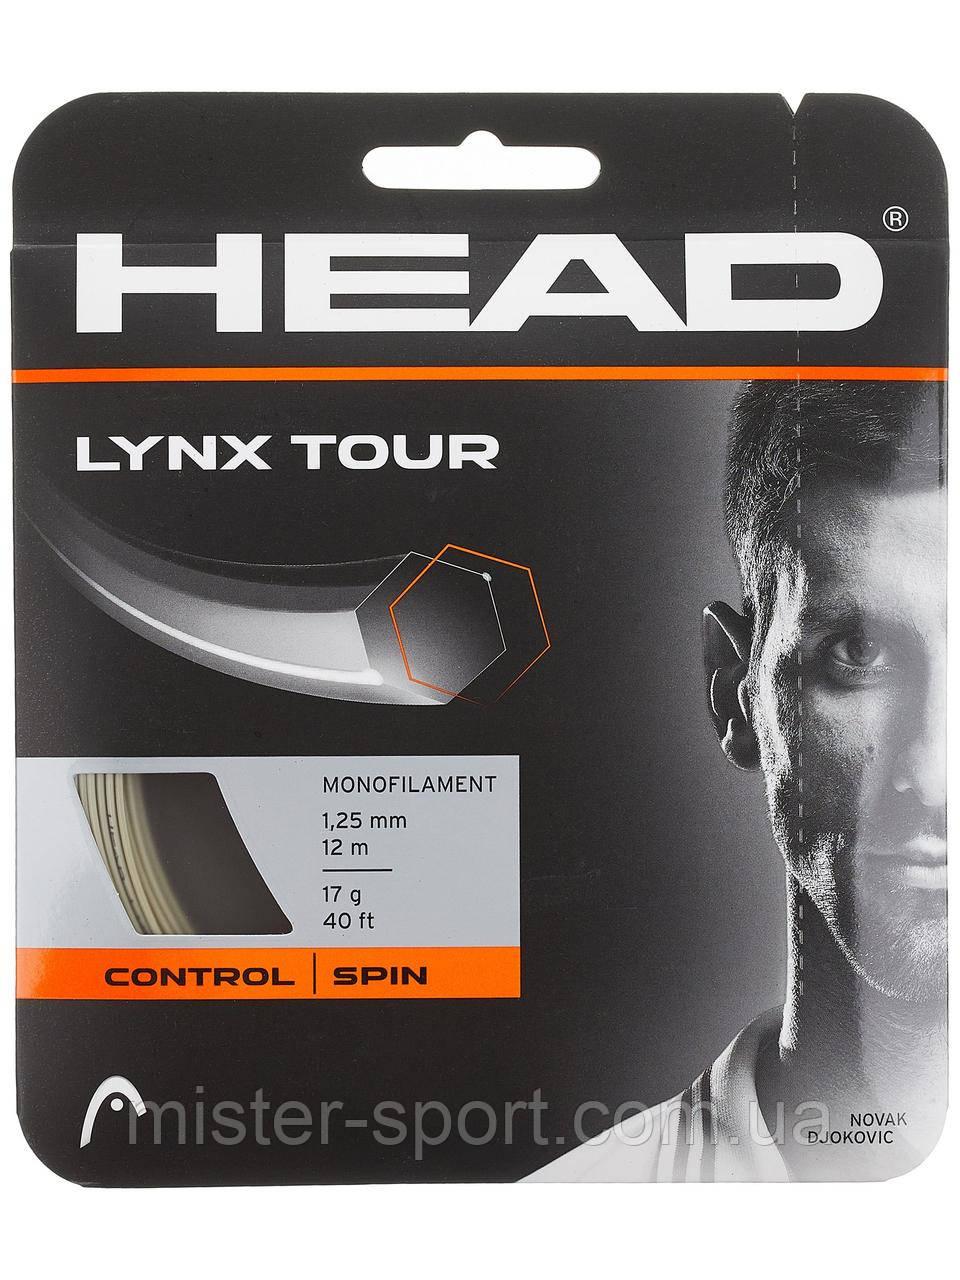 Head Lynx Tour струны для тенниса 1.25мм/12 м. голд